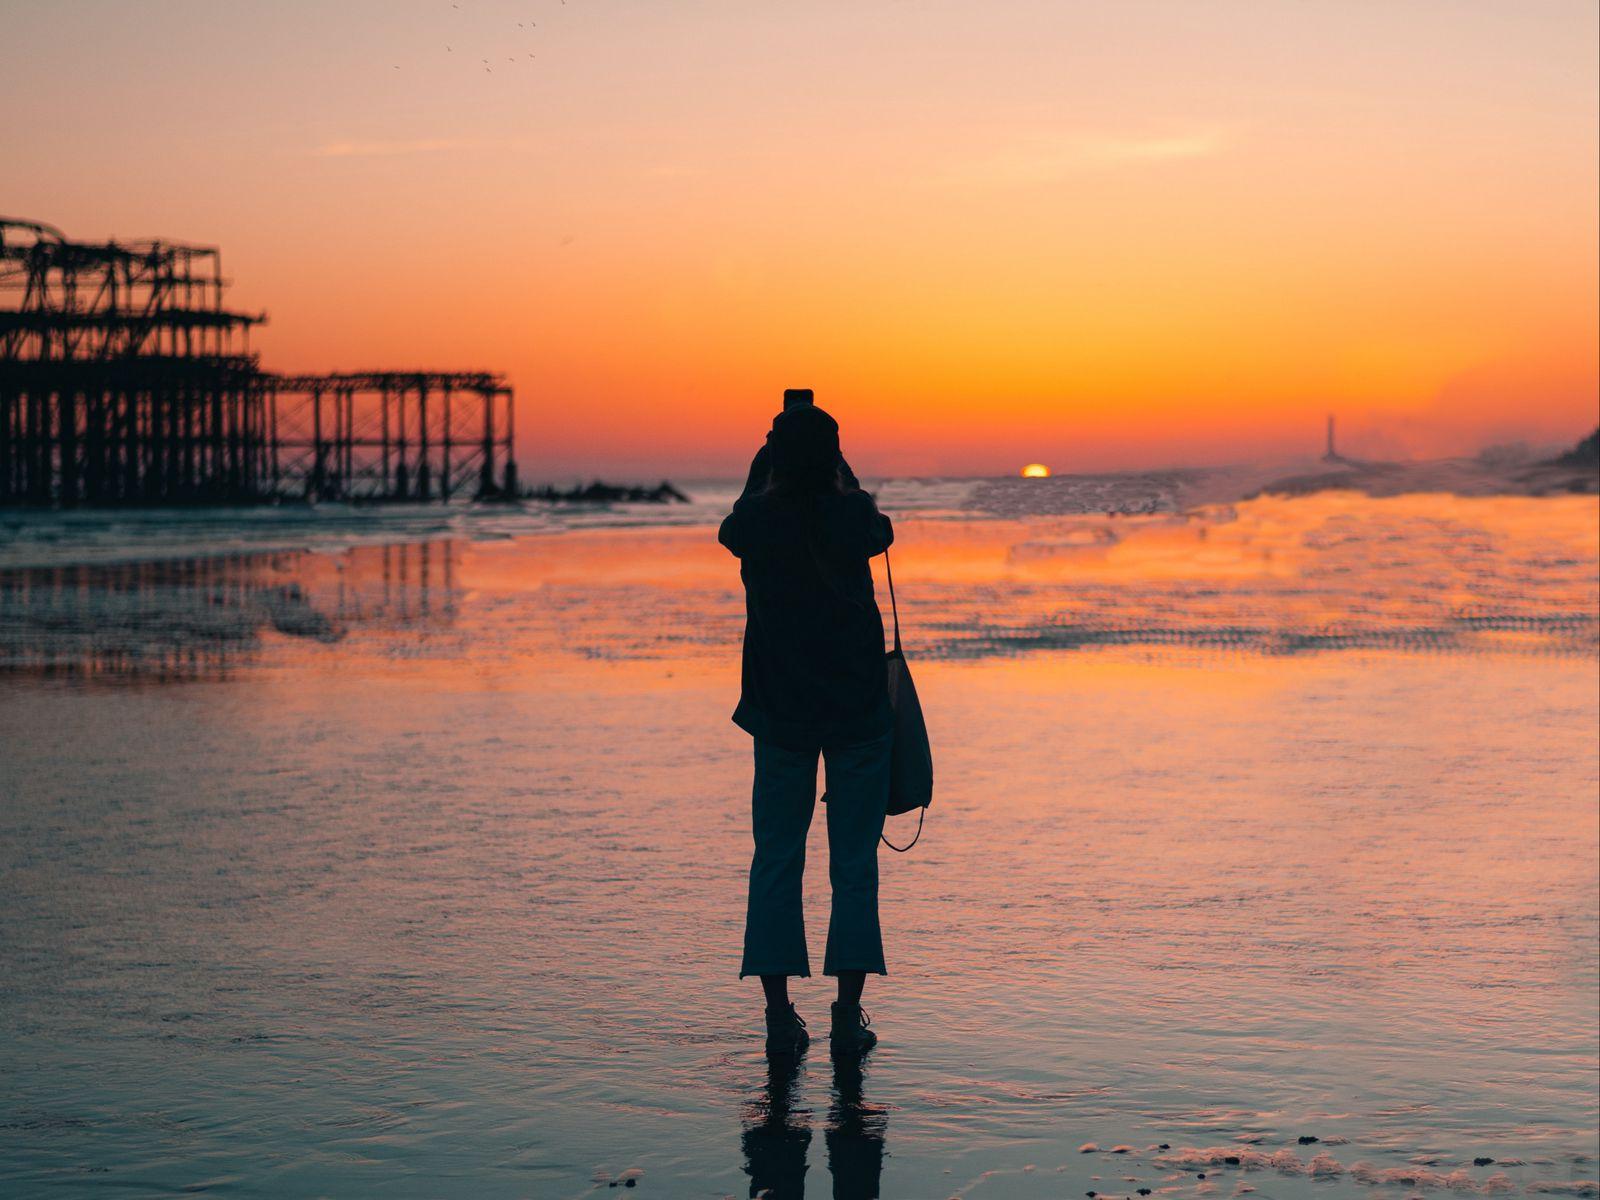 1600x1200 Wallpaper silhouette, alone, beach, sea, sunset, dark